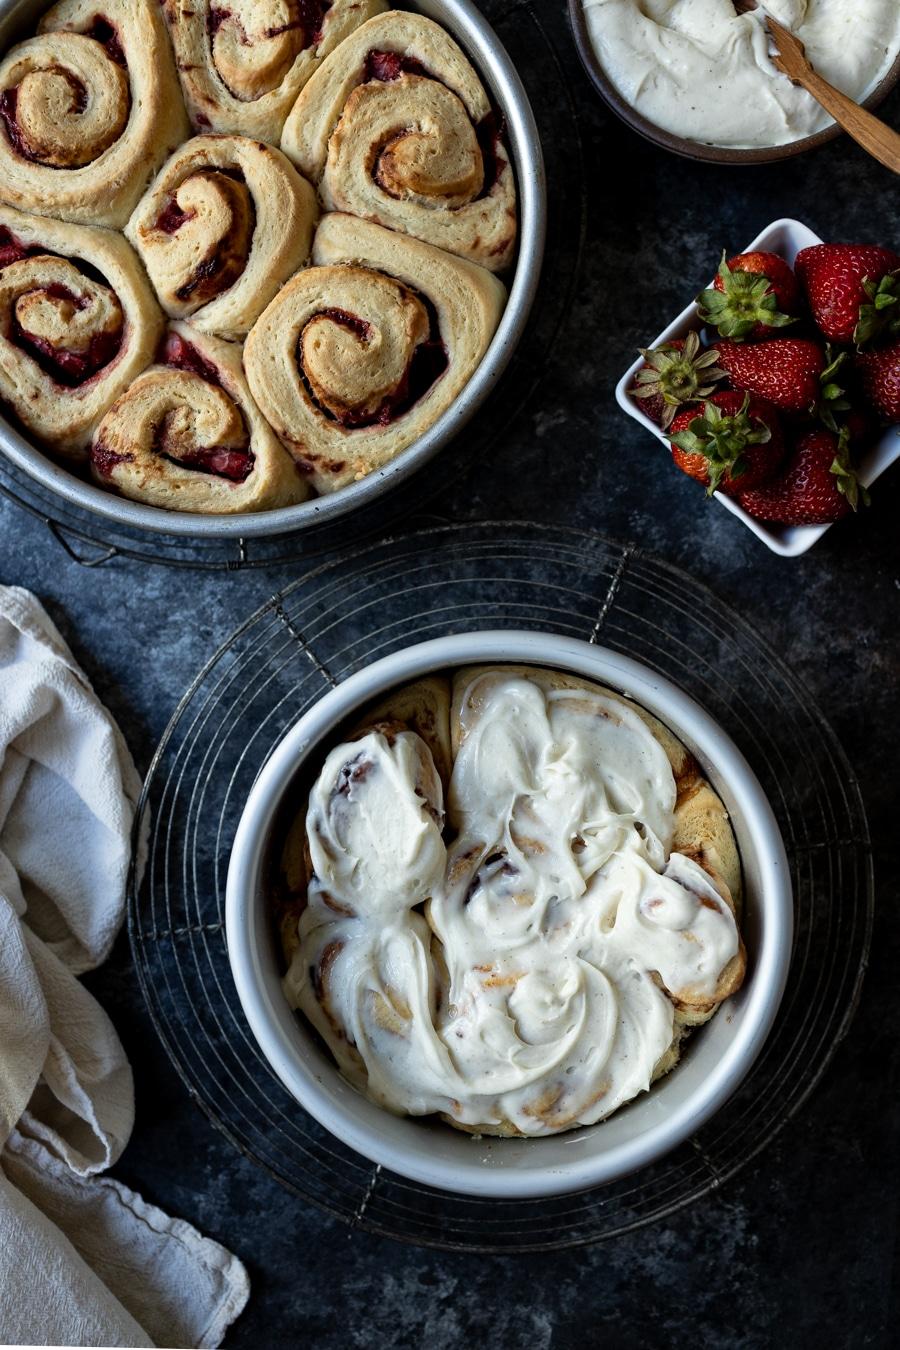 Strawberries and Cream Sweet Rolls